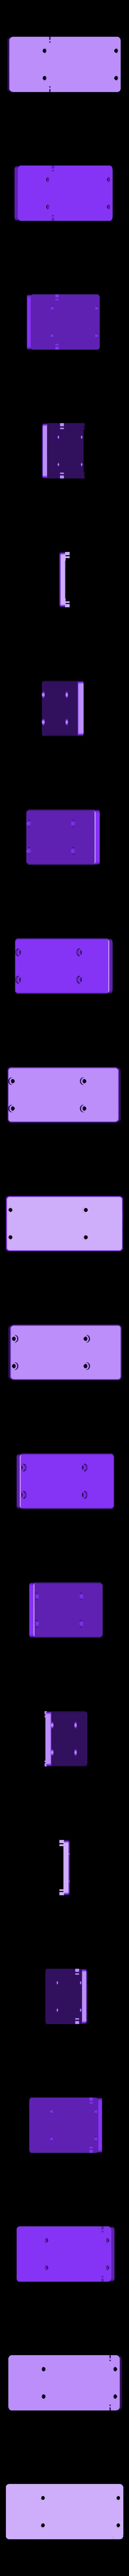 Hanger_Base_001a.STL Download free STL file Wobble Fish! • 3D printing model, Tarnliare